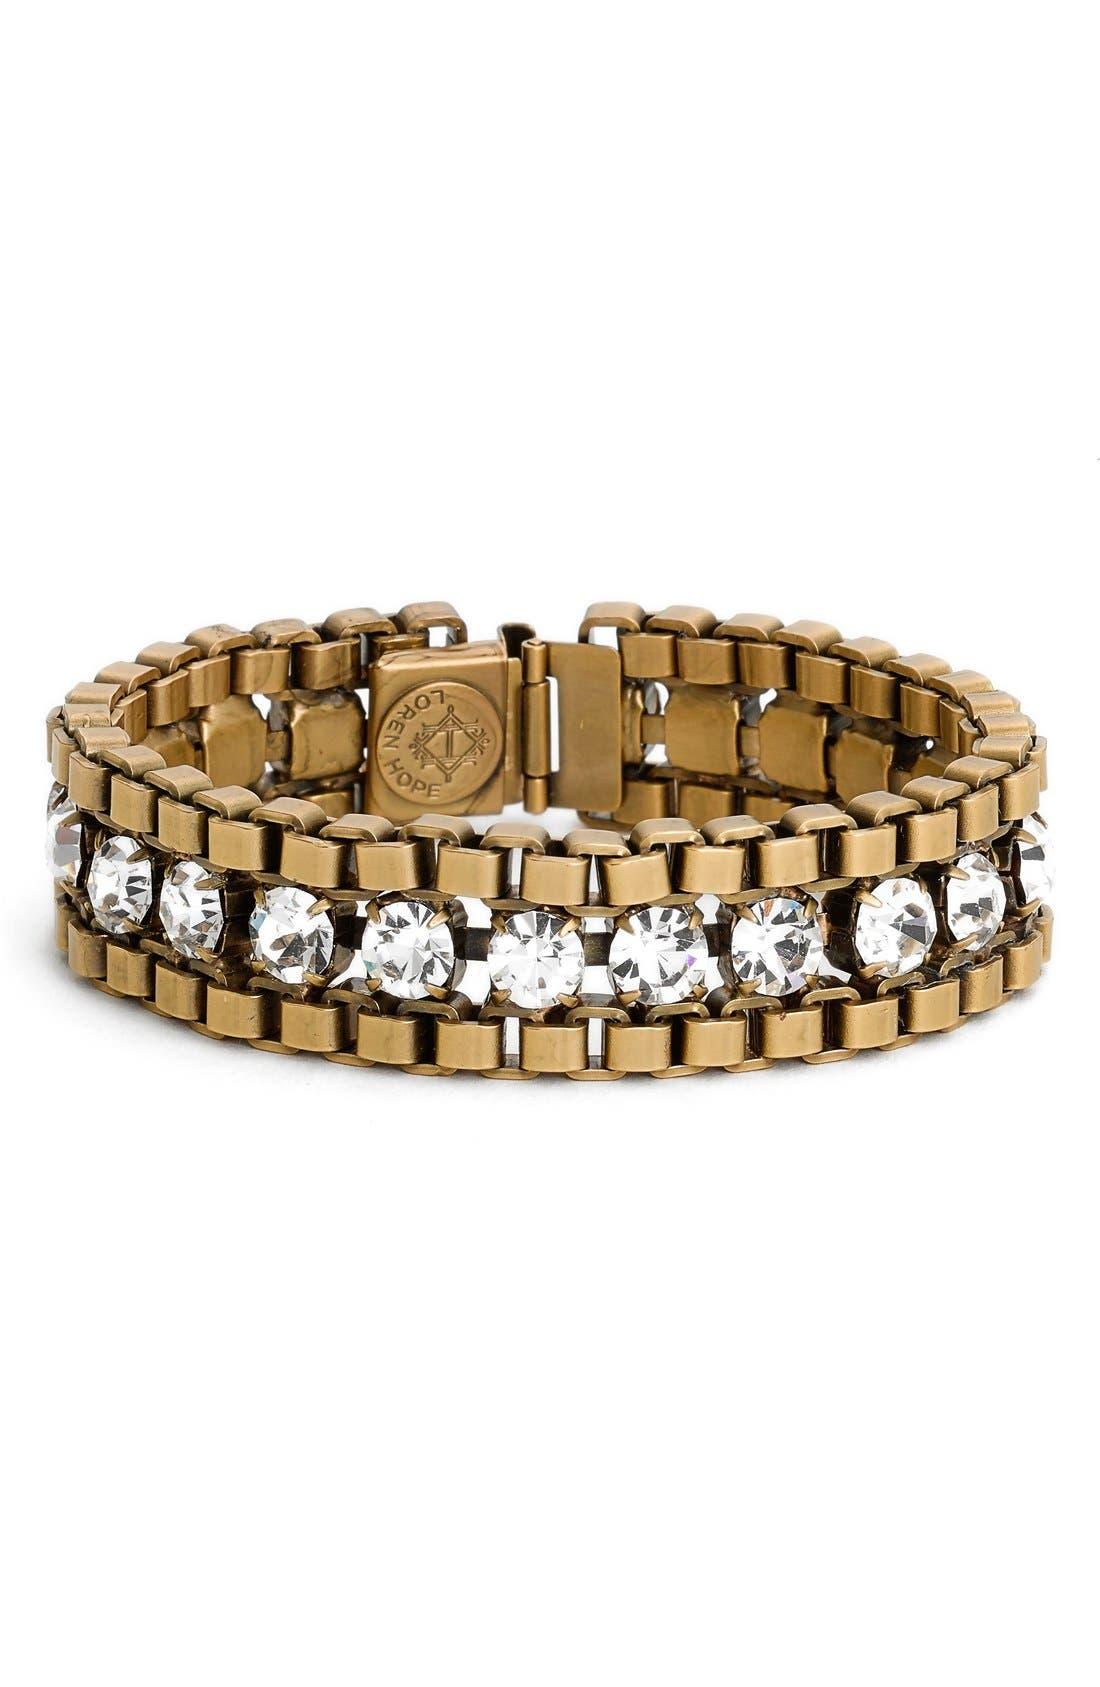 Loren Hope 'Carly' Crystal & Chain Bracelet